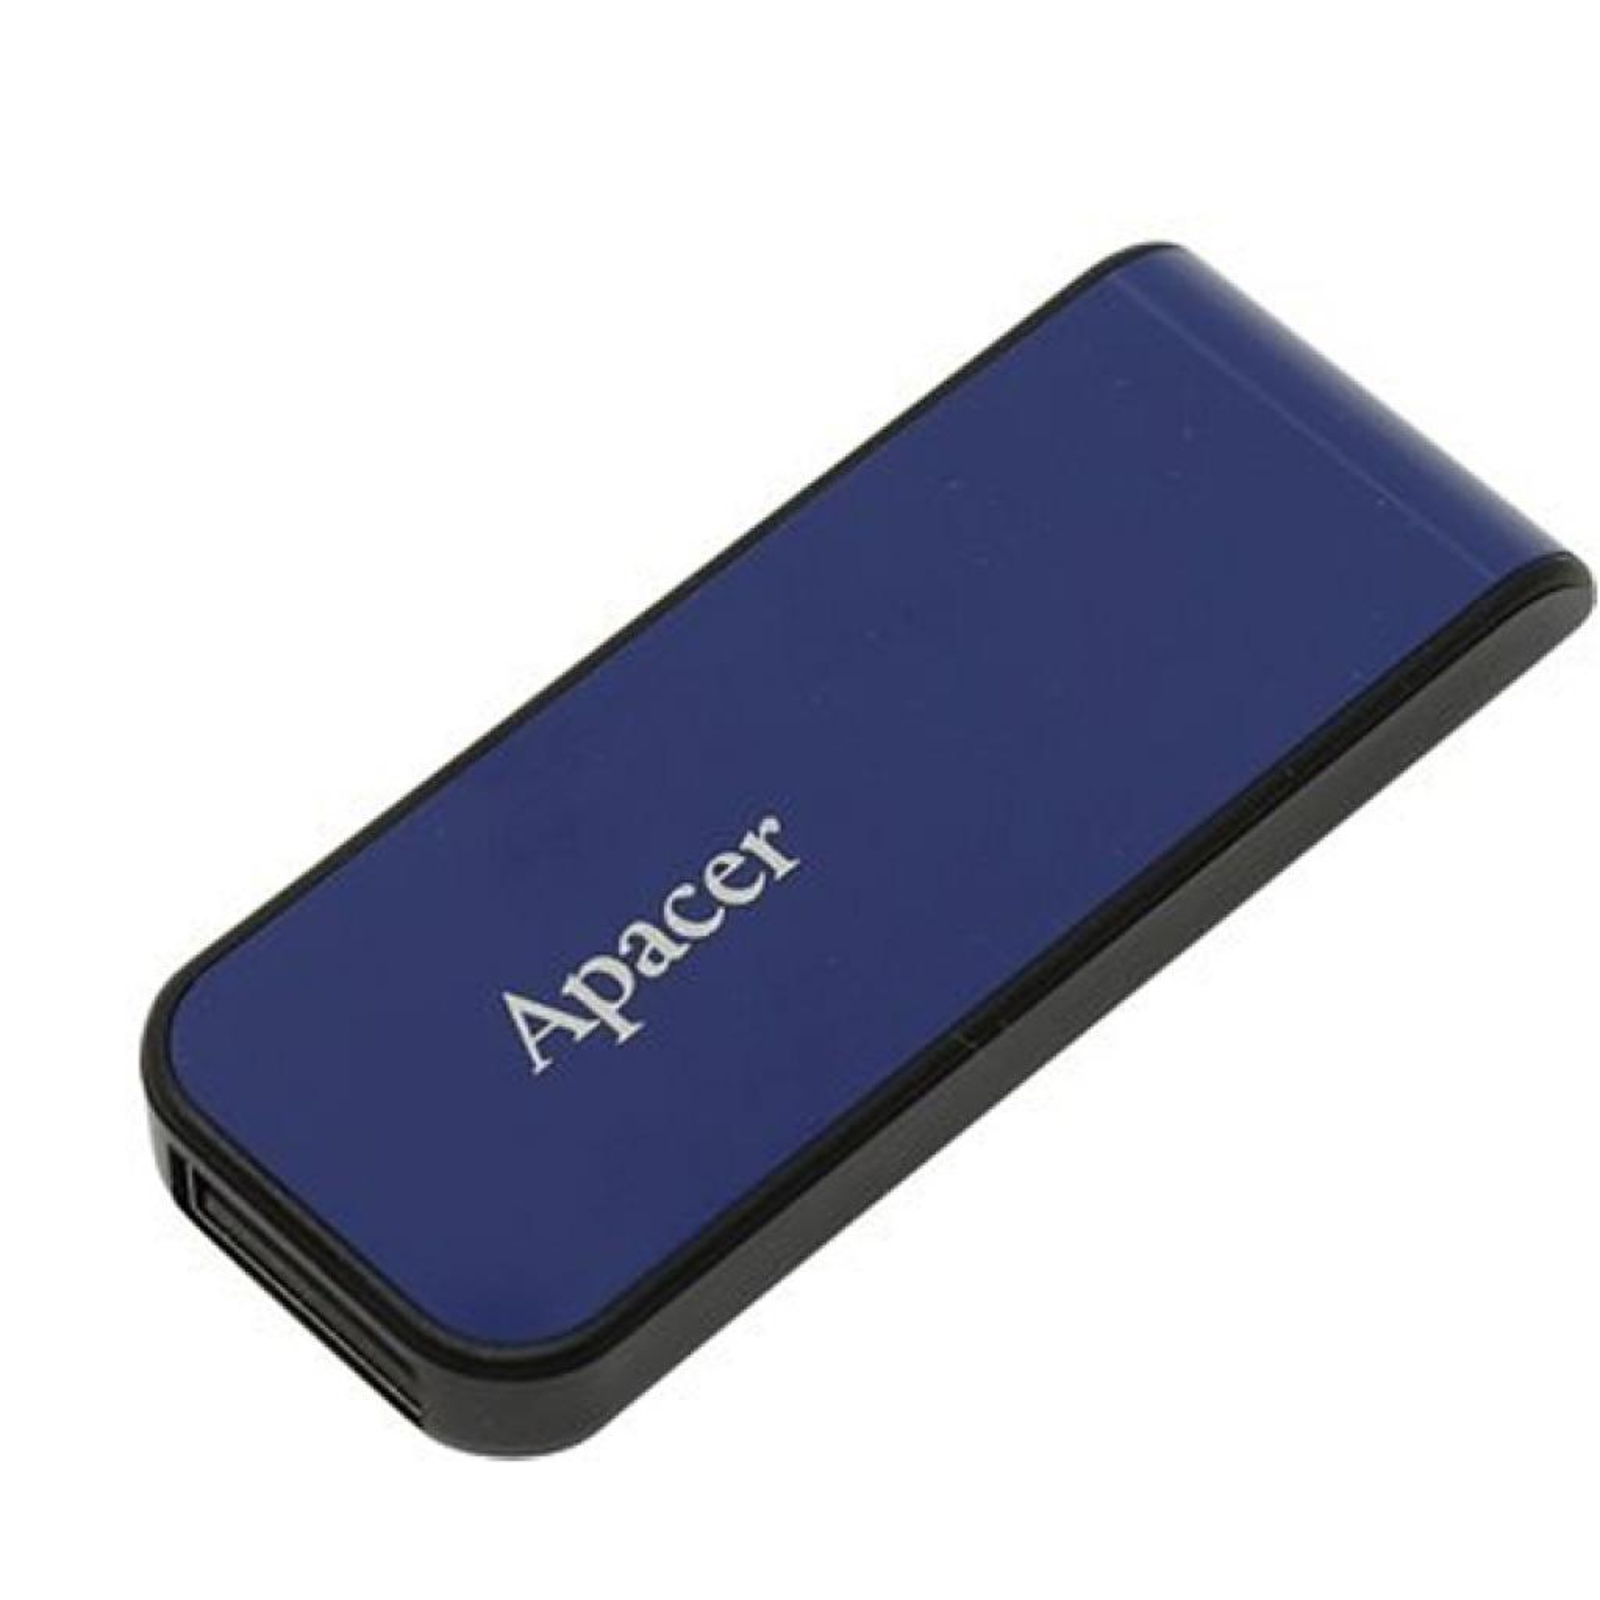 USB флеш накопитель Apacer 64GB AH334 blue USB 2.0 (AP64GAH334U-1) изображение 5